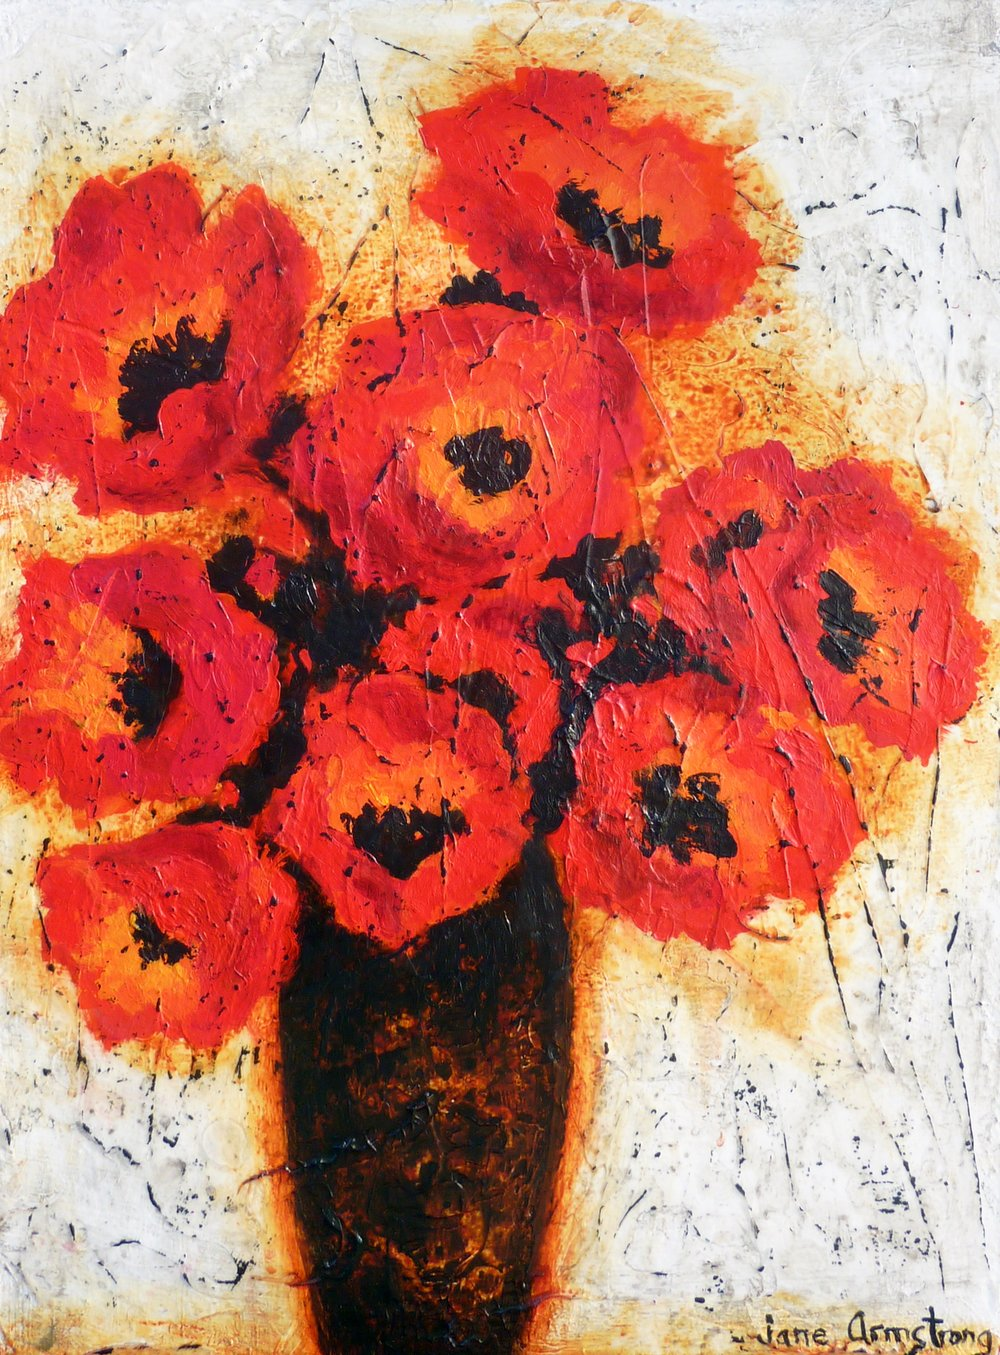 Vase of Red Matadors Acrylic 24 x 18